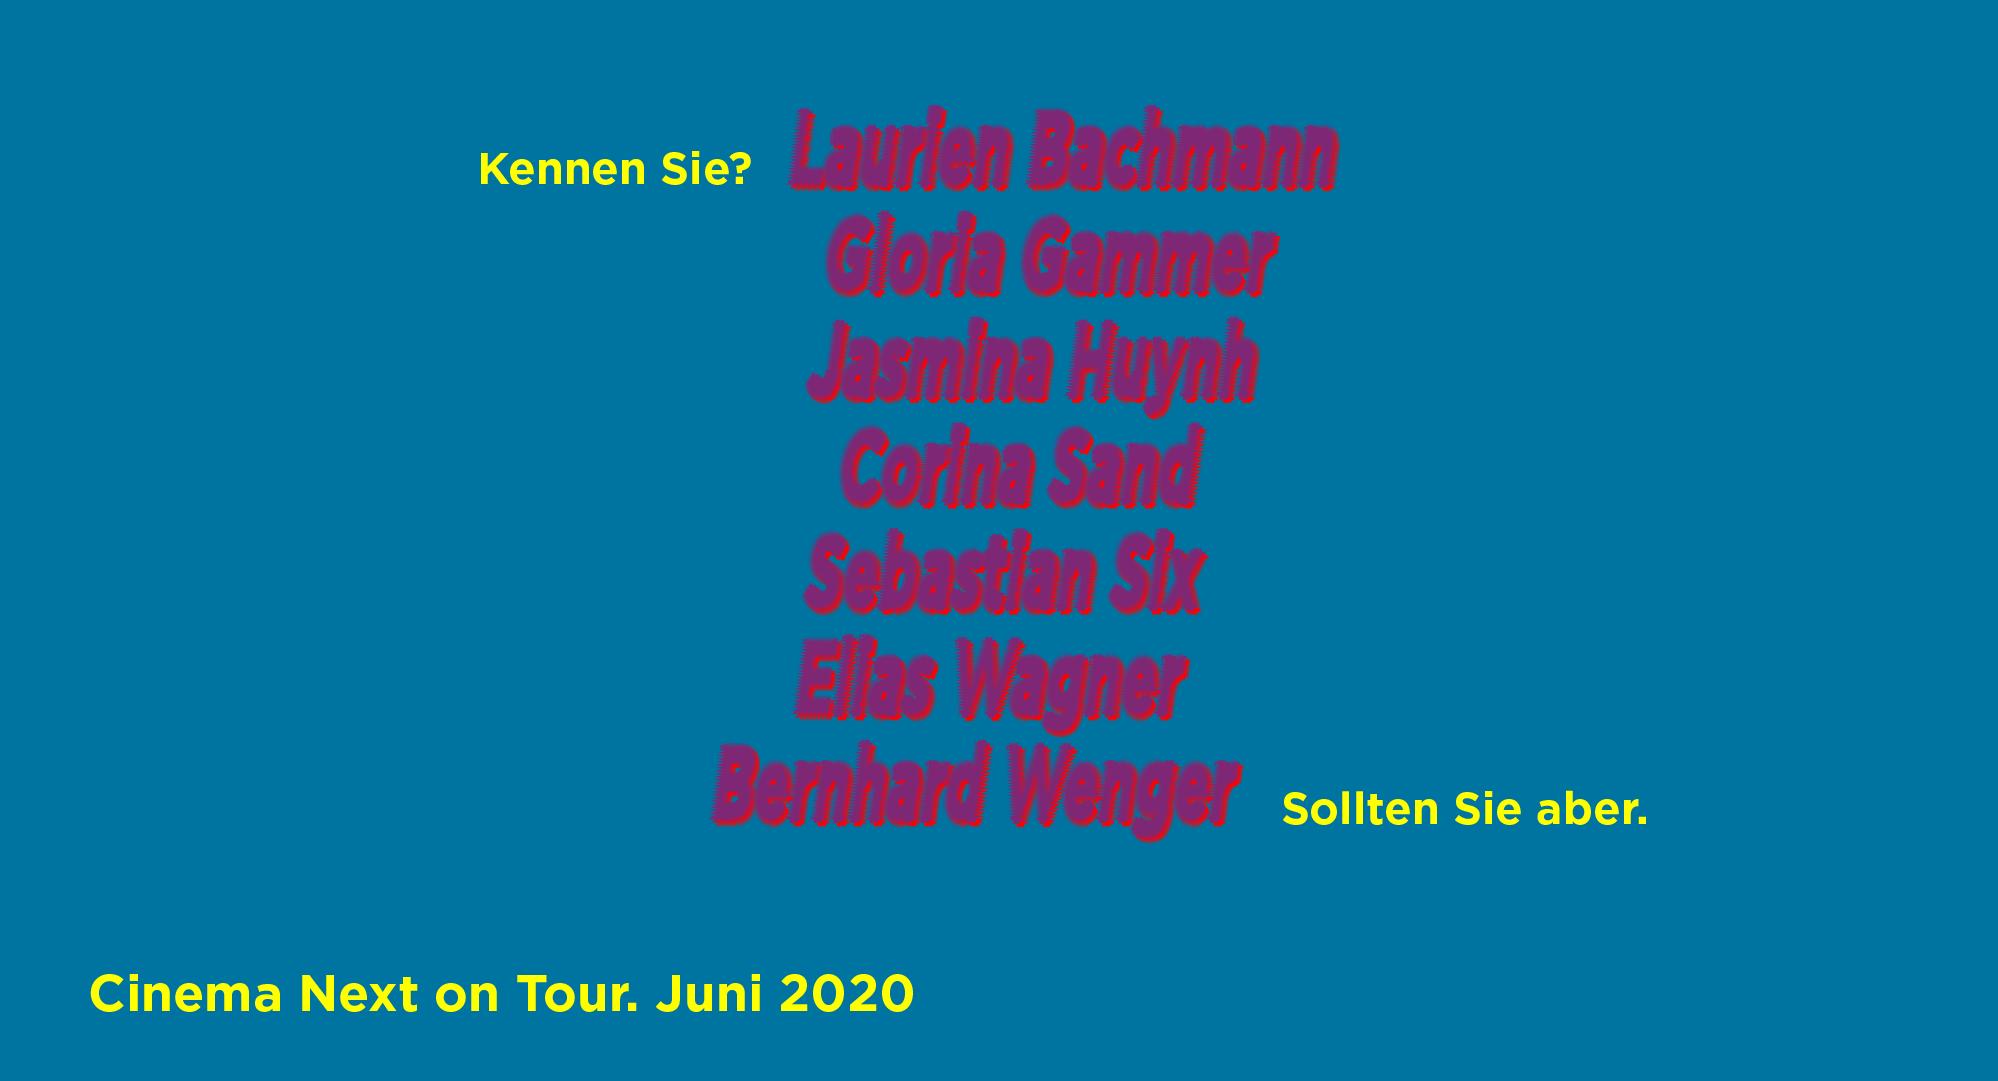 Linz-Programm. Host: Moviemento